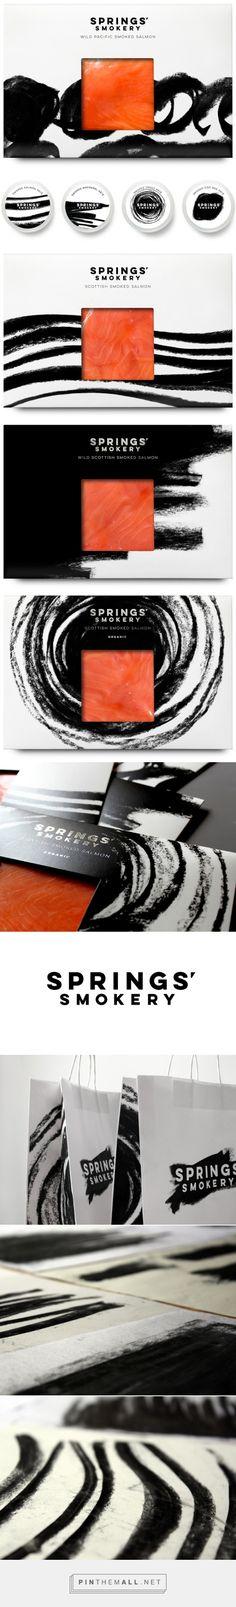 Springs' Smokery #salmon #packaging designed by Distil Studio - http://www.packagingoftheworld.com/2015/08/springs-smokery.html